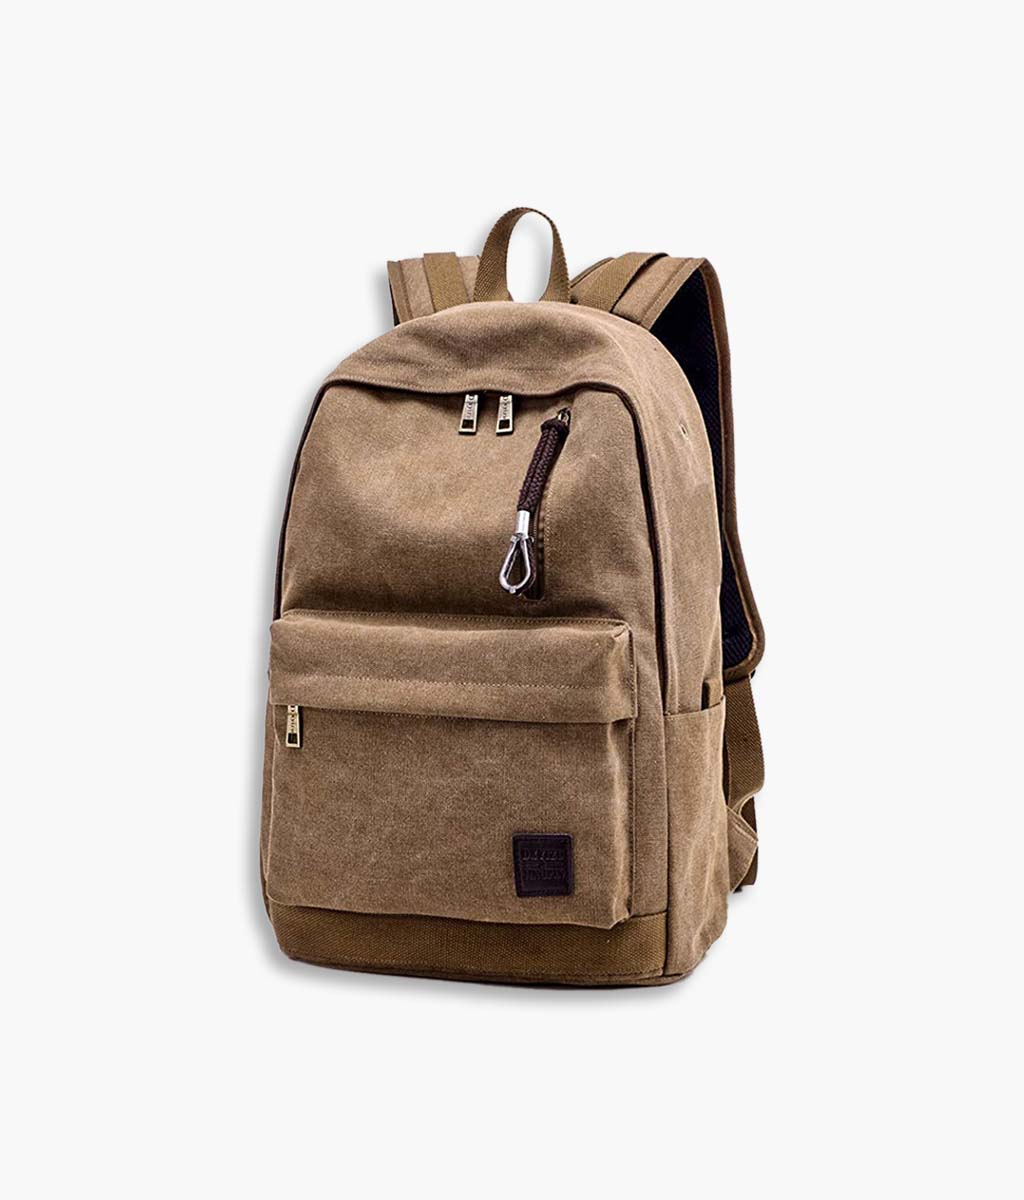 Heavy Duty Canvas Backpack